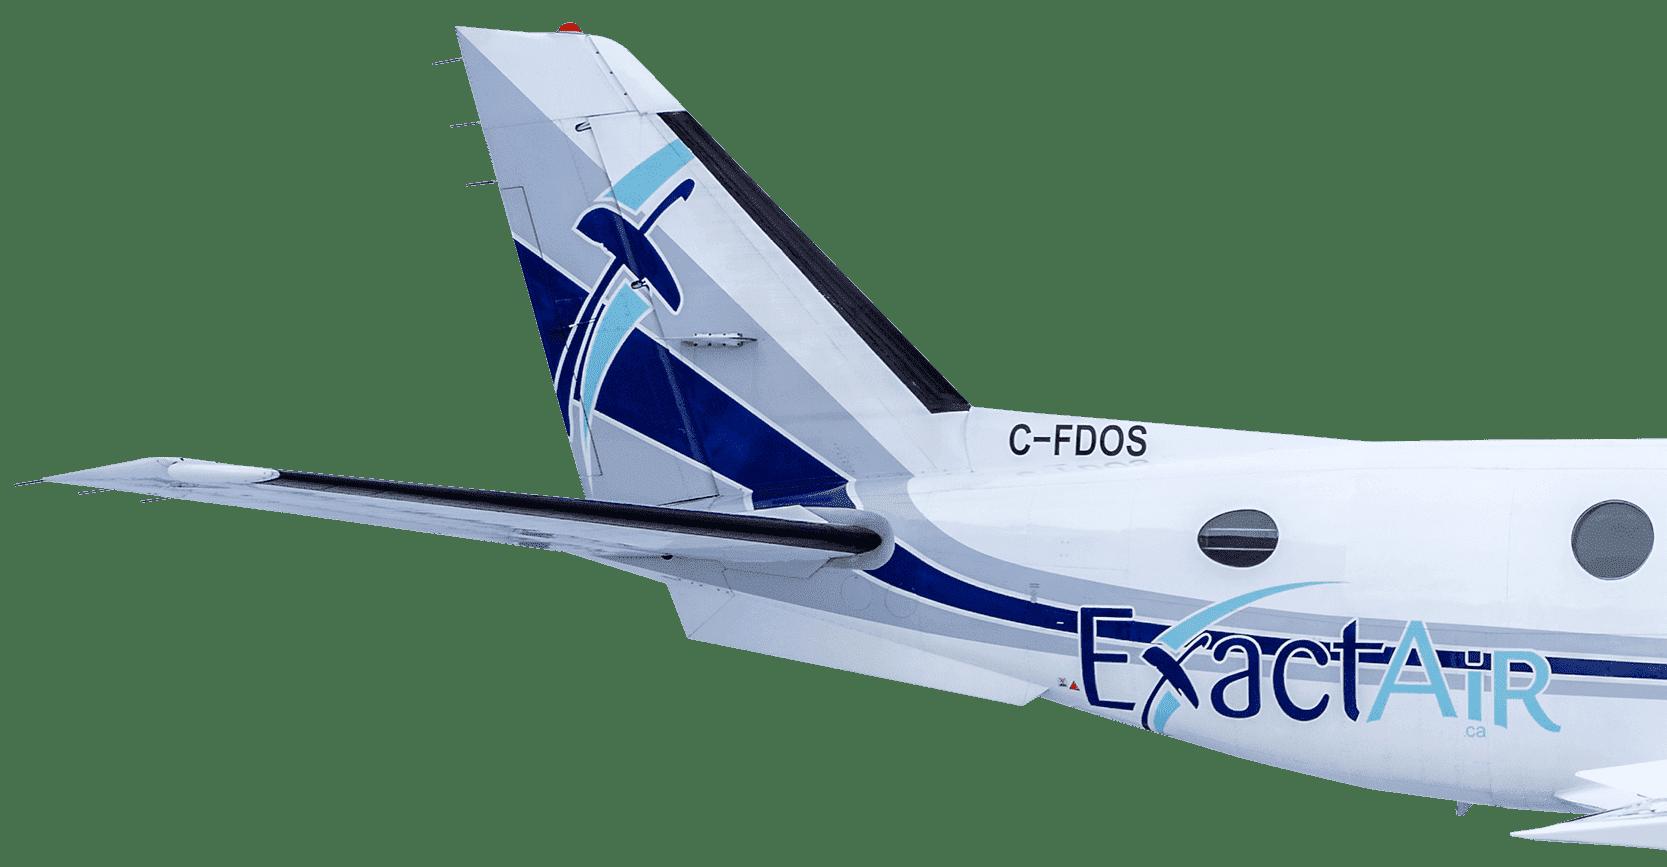 Avion Exactair